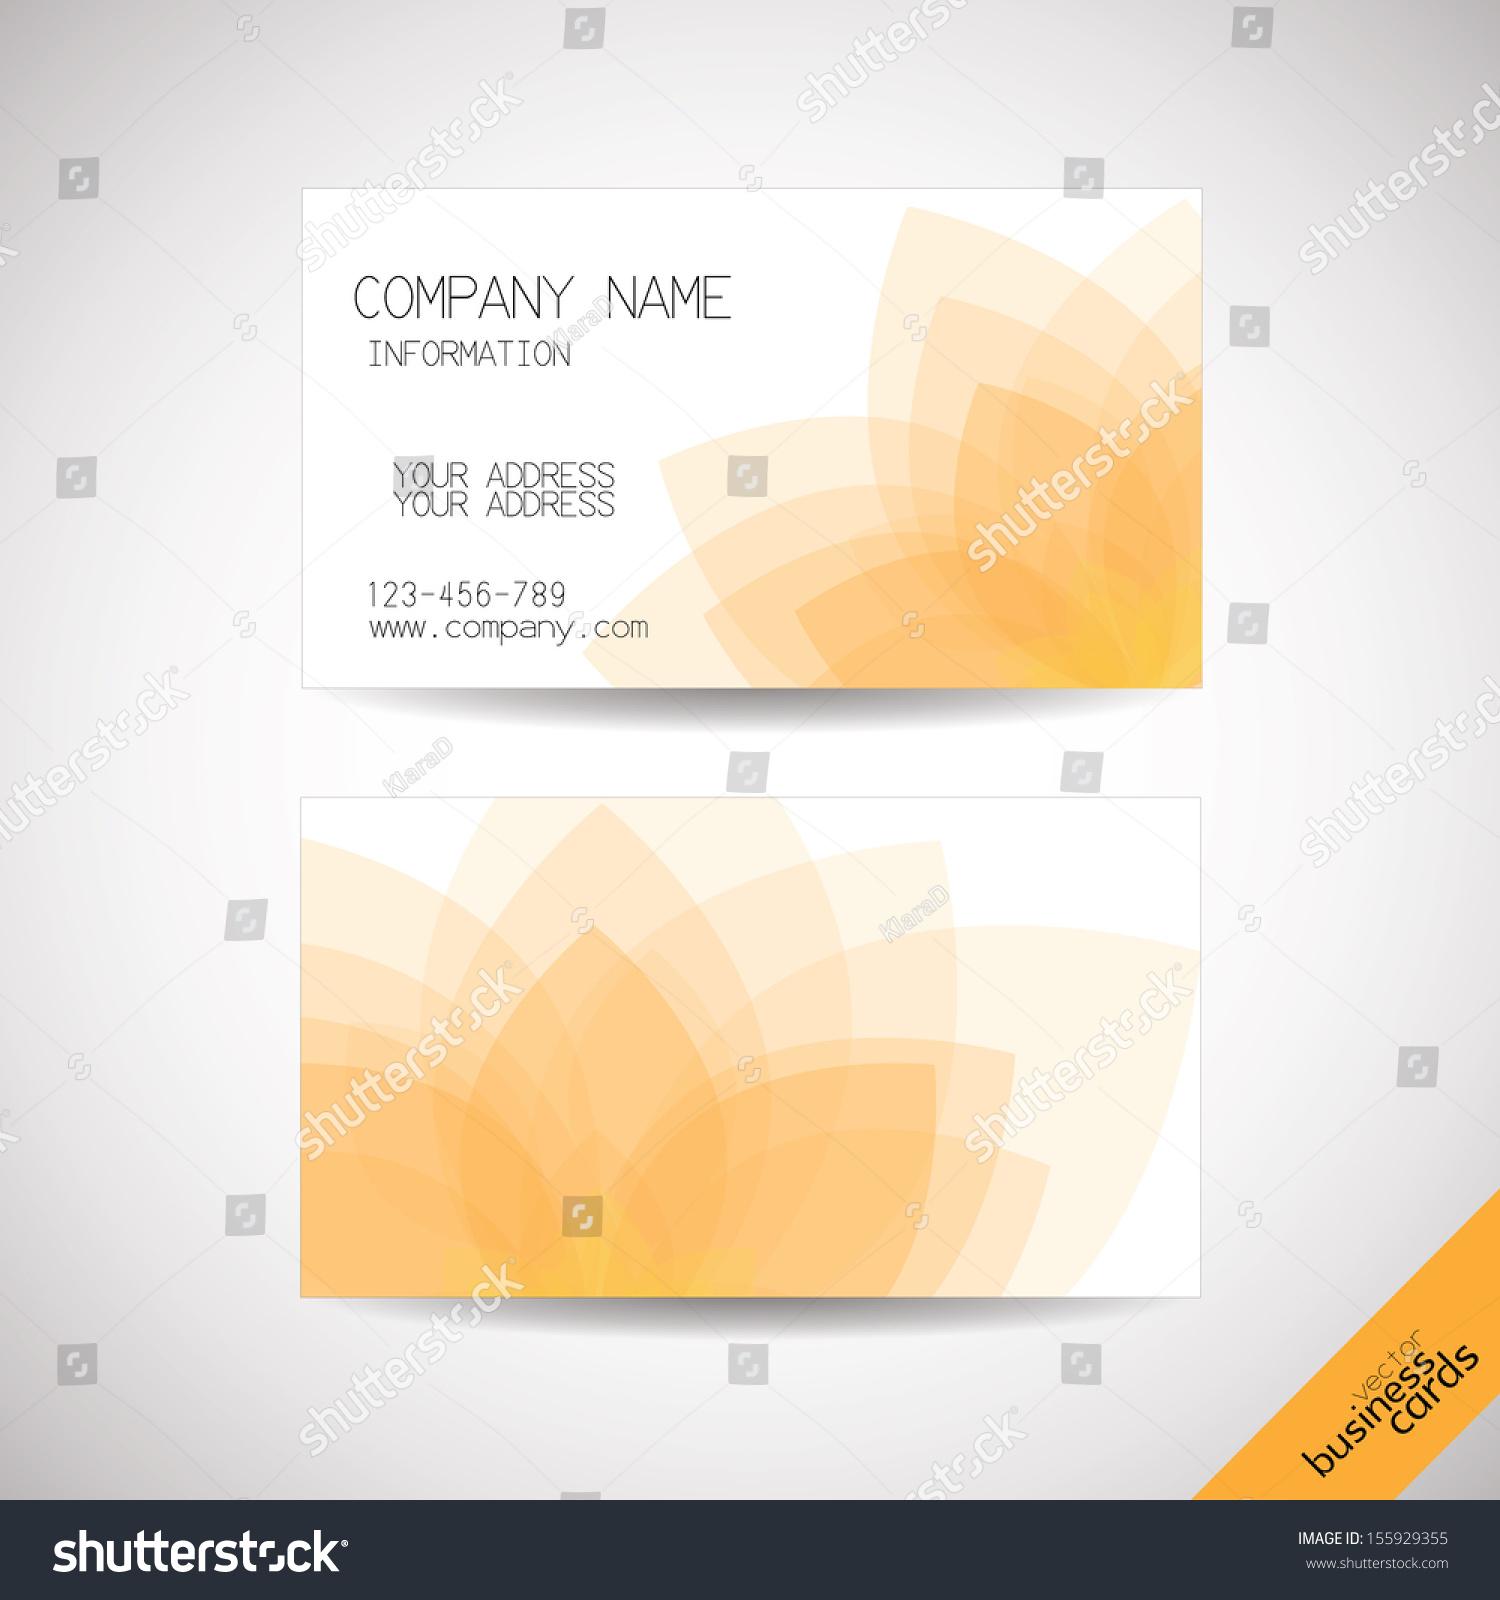 Cool Lotus Business Cards Images - Business Card Ideas - etadam.info